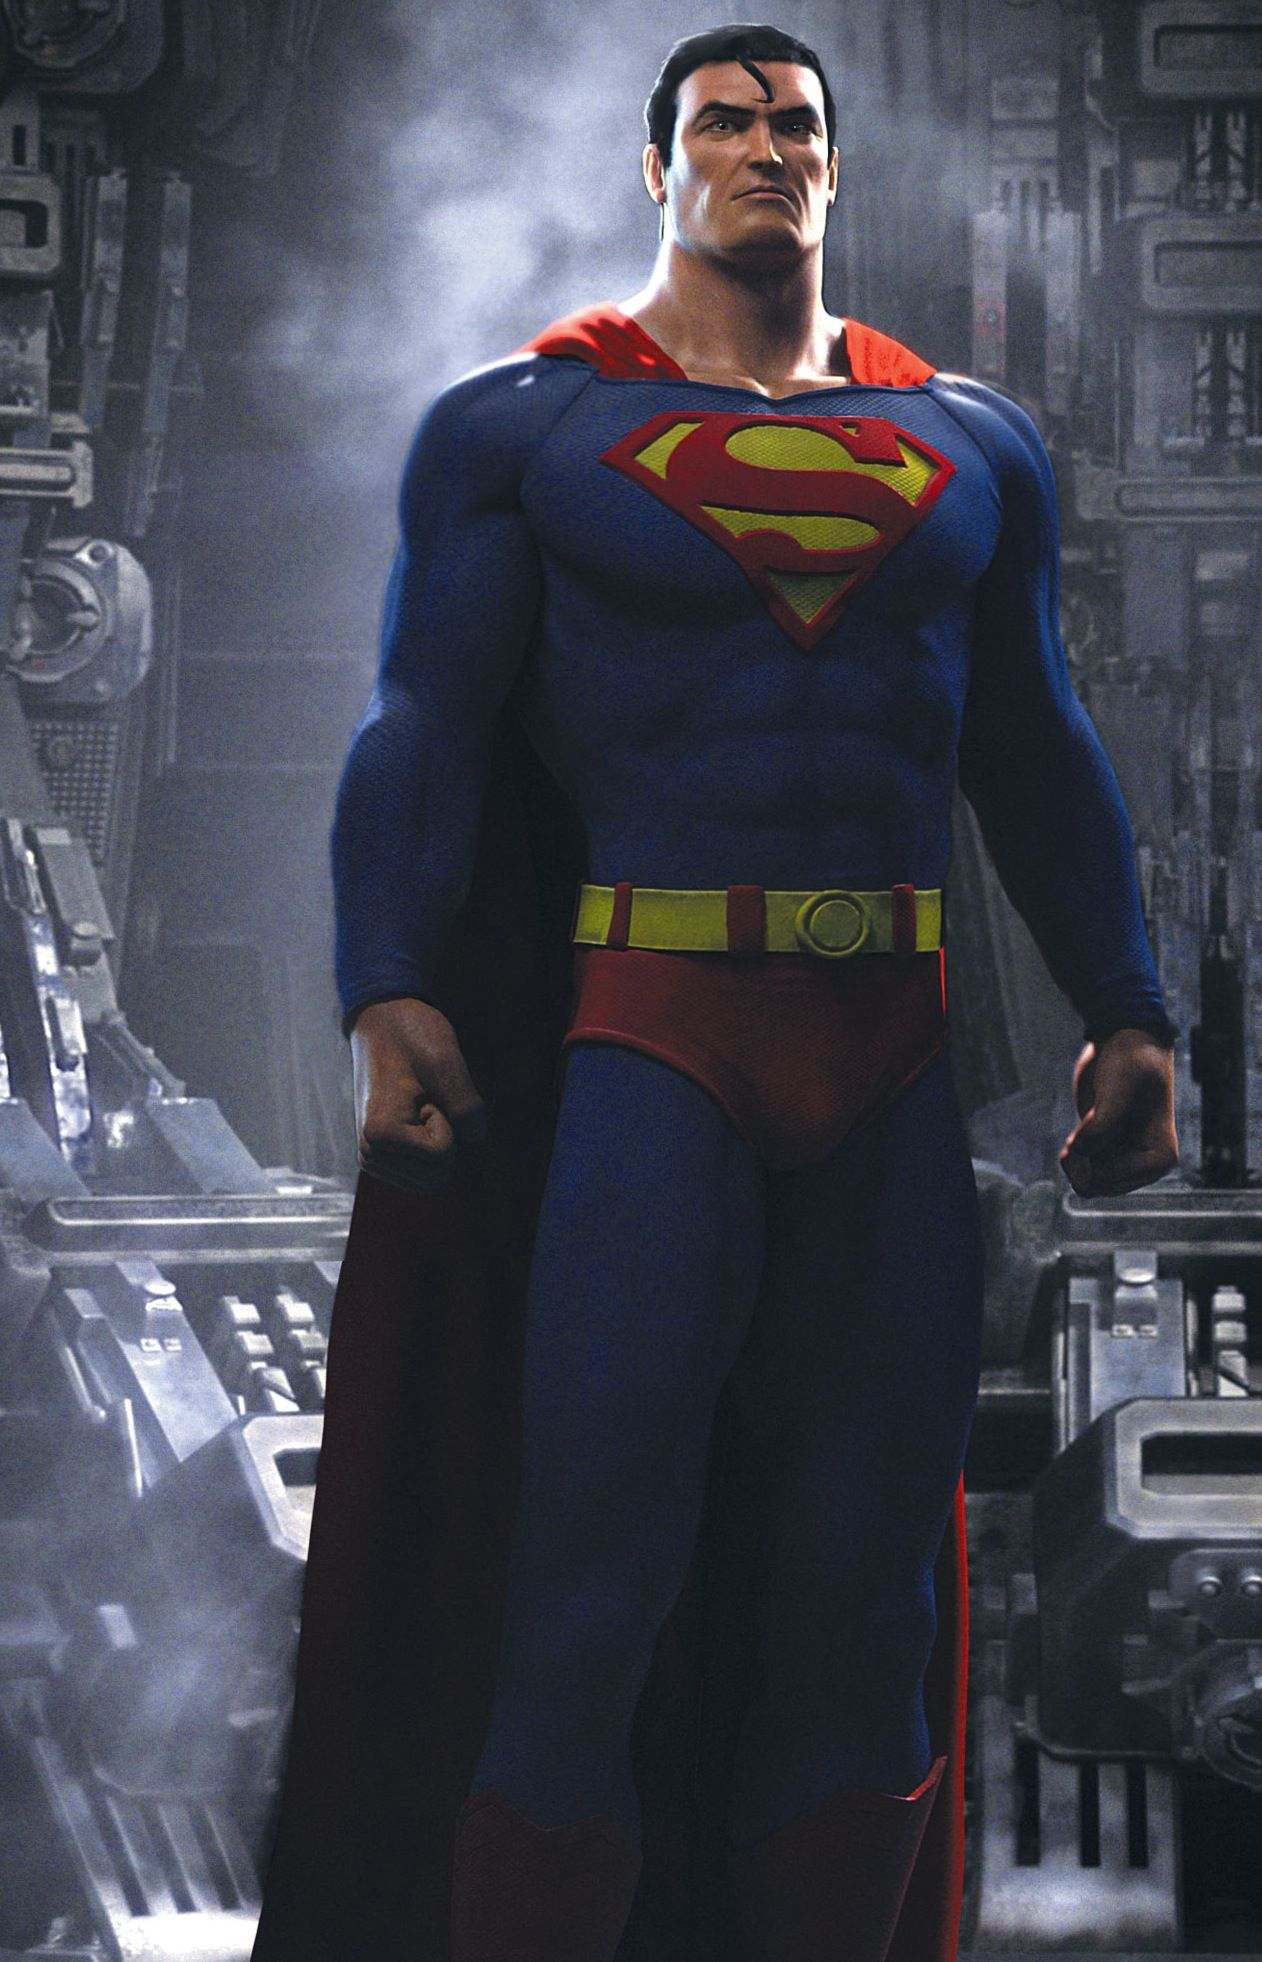 Superman Fan Art Dc Universe Online Legends 2 Cover By Blur The 5 Står åward Of Superman Man Of Steel Superman Movies Batman And Superman